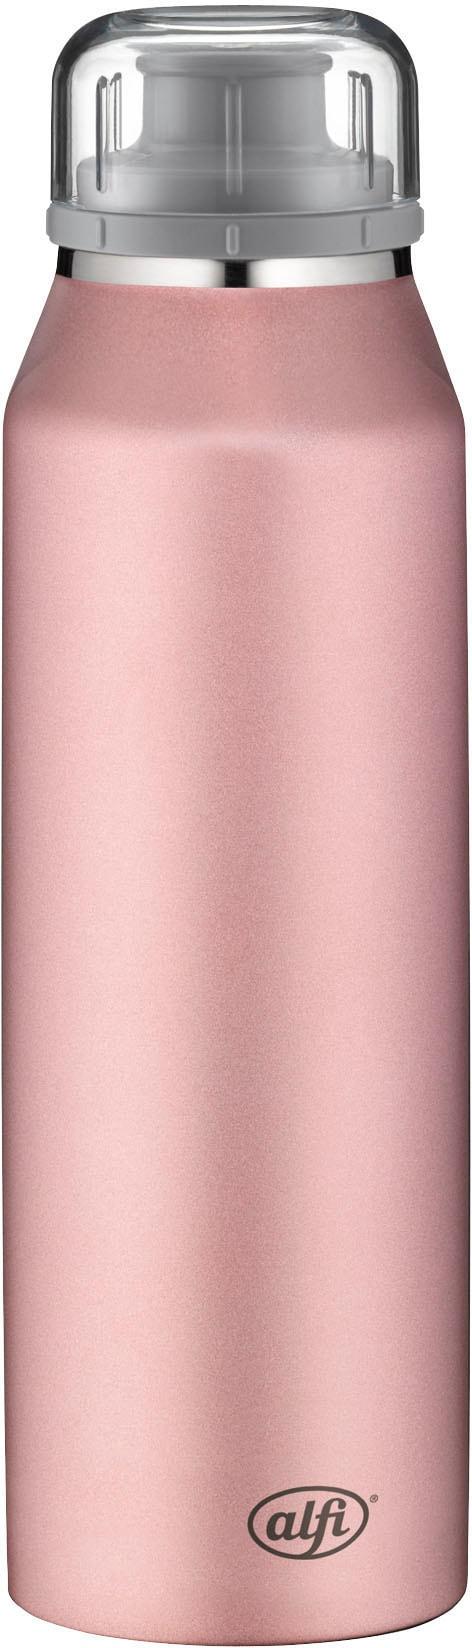 Alfi Thermoflasche Pure, 500 ml rosa Campinggeschirr Camping Schlafen Outdoor